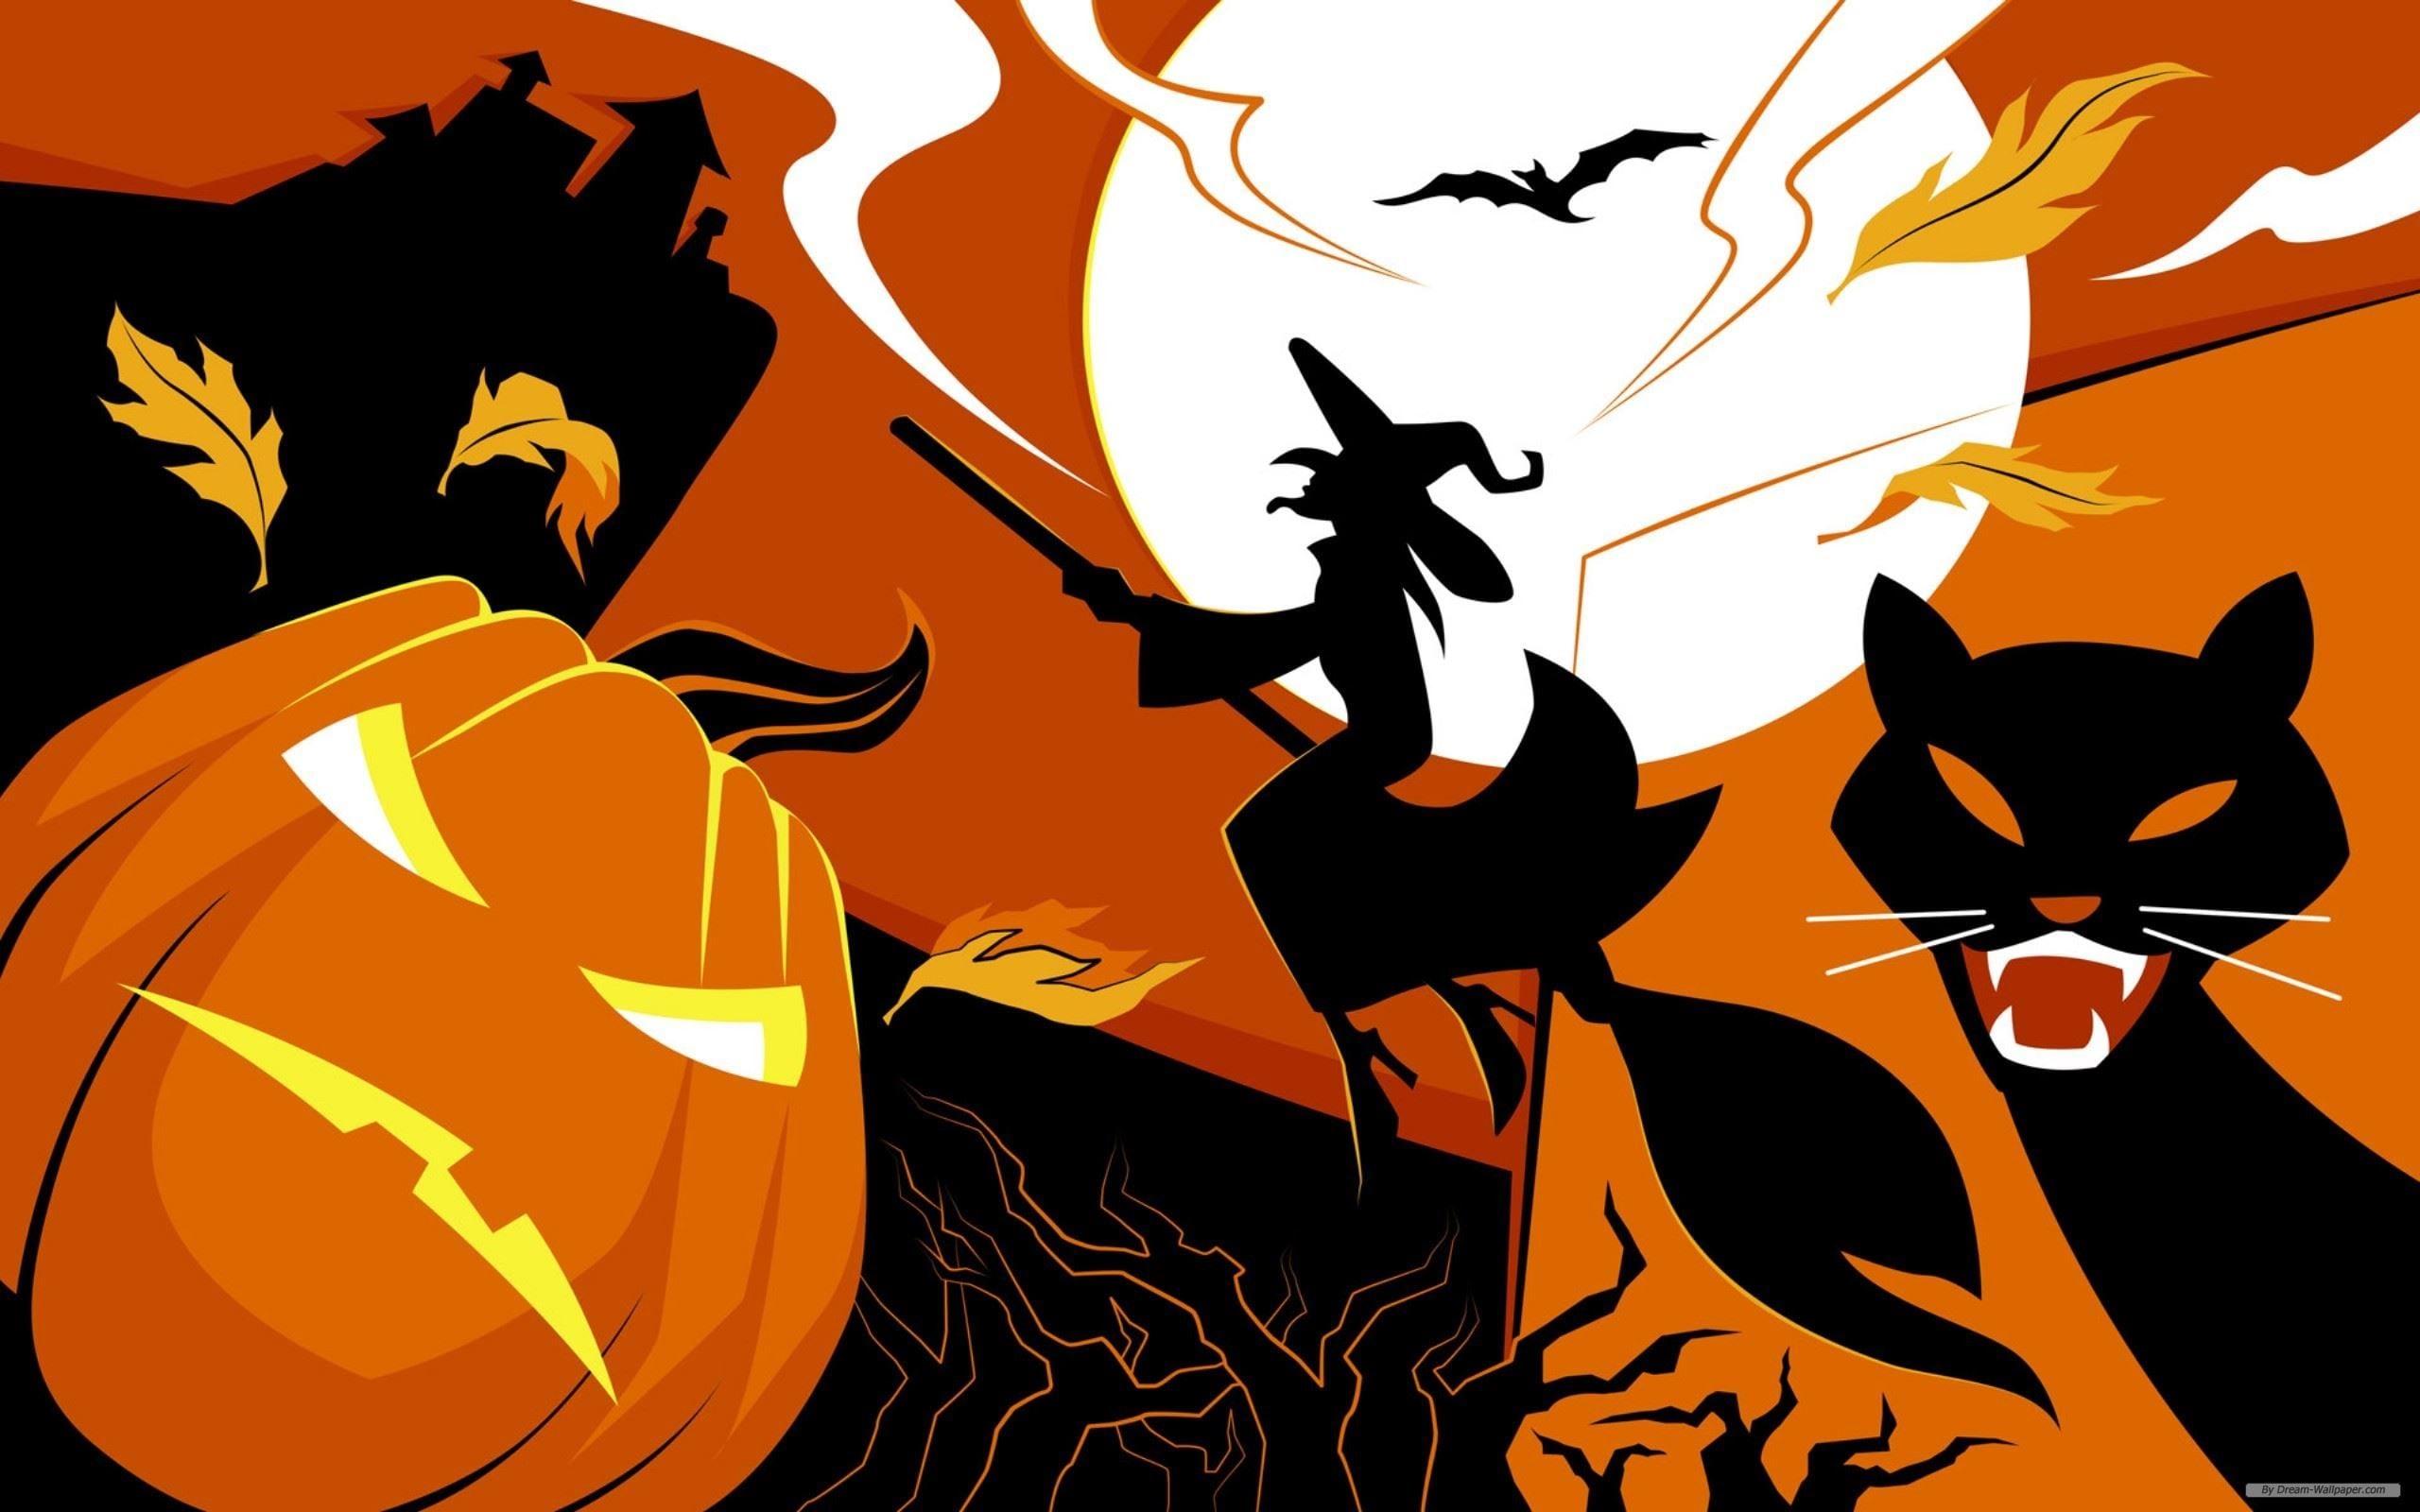 Download Free Halloween Wallpaper for Mac OS X El Capitan and Windows 10